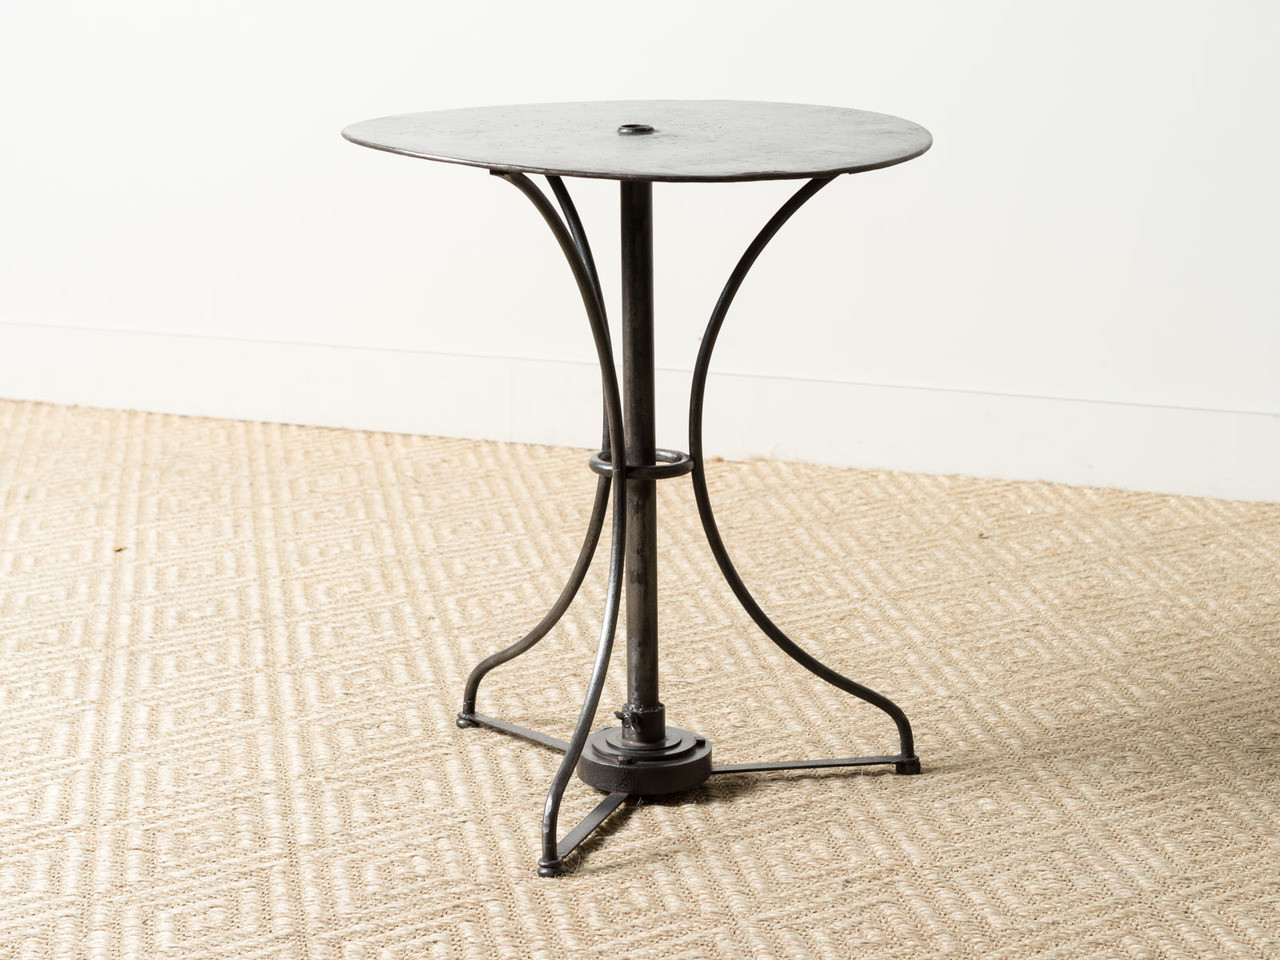 VINTAGE METAL BISTRO TABLE